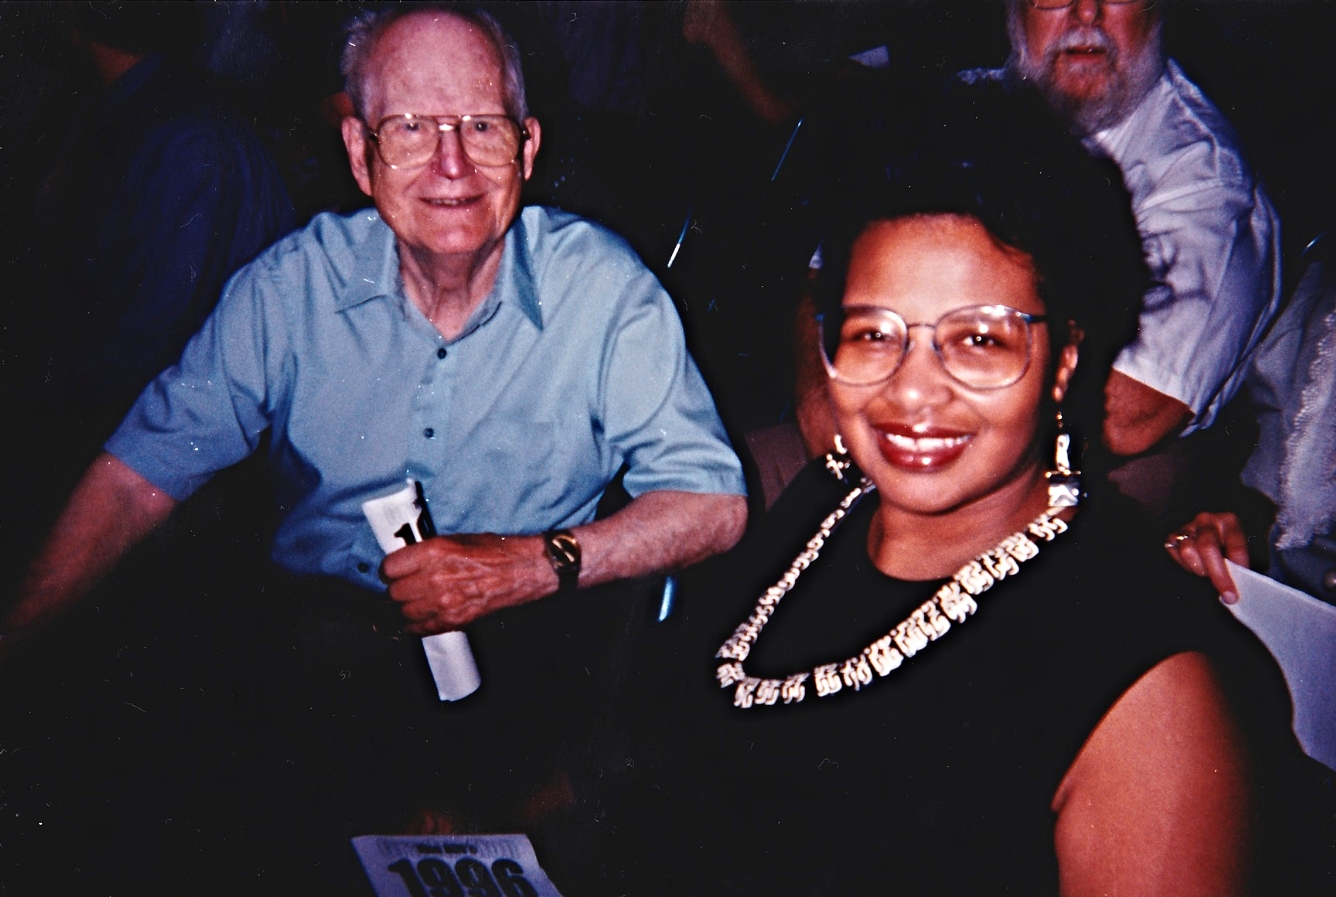 My graduation from 8th grade:Grampy + Rev. Marjorie Bowens-Wheatley, my mentor (June 1996)